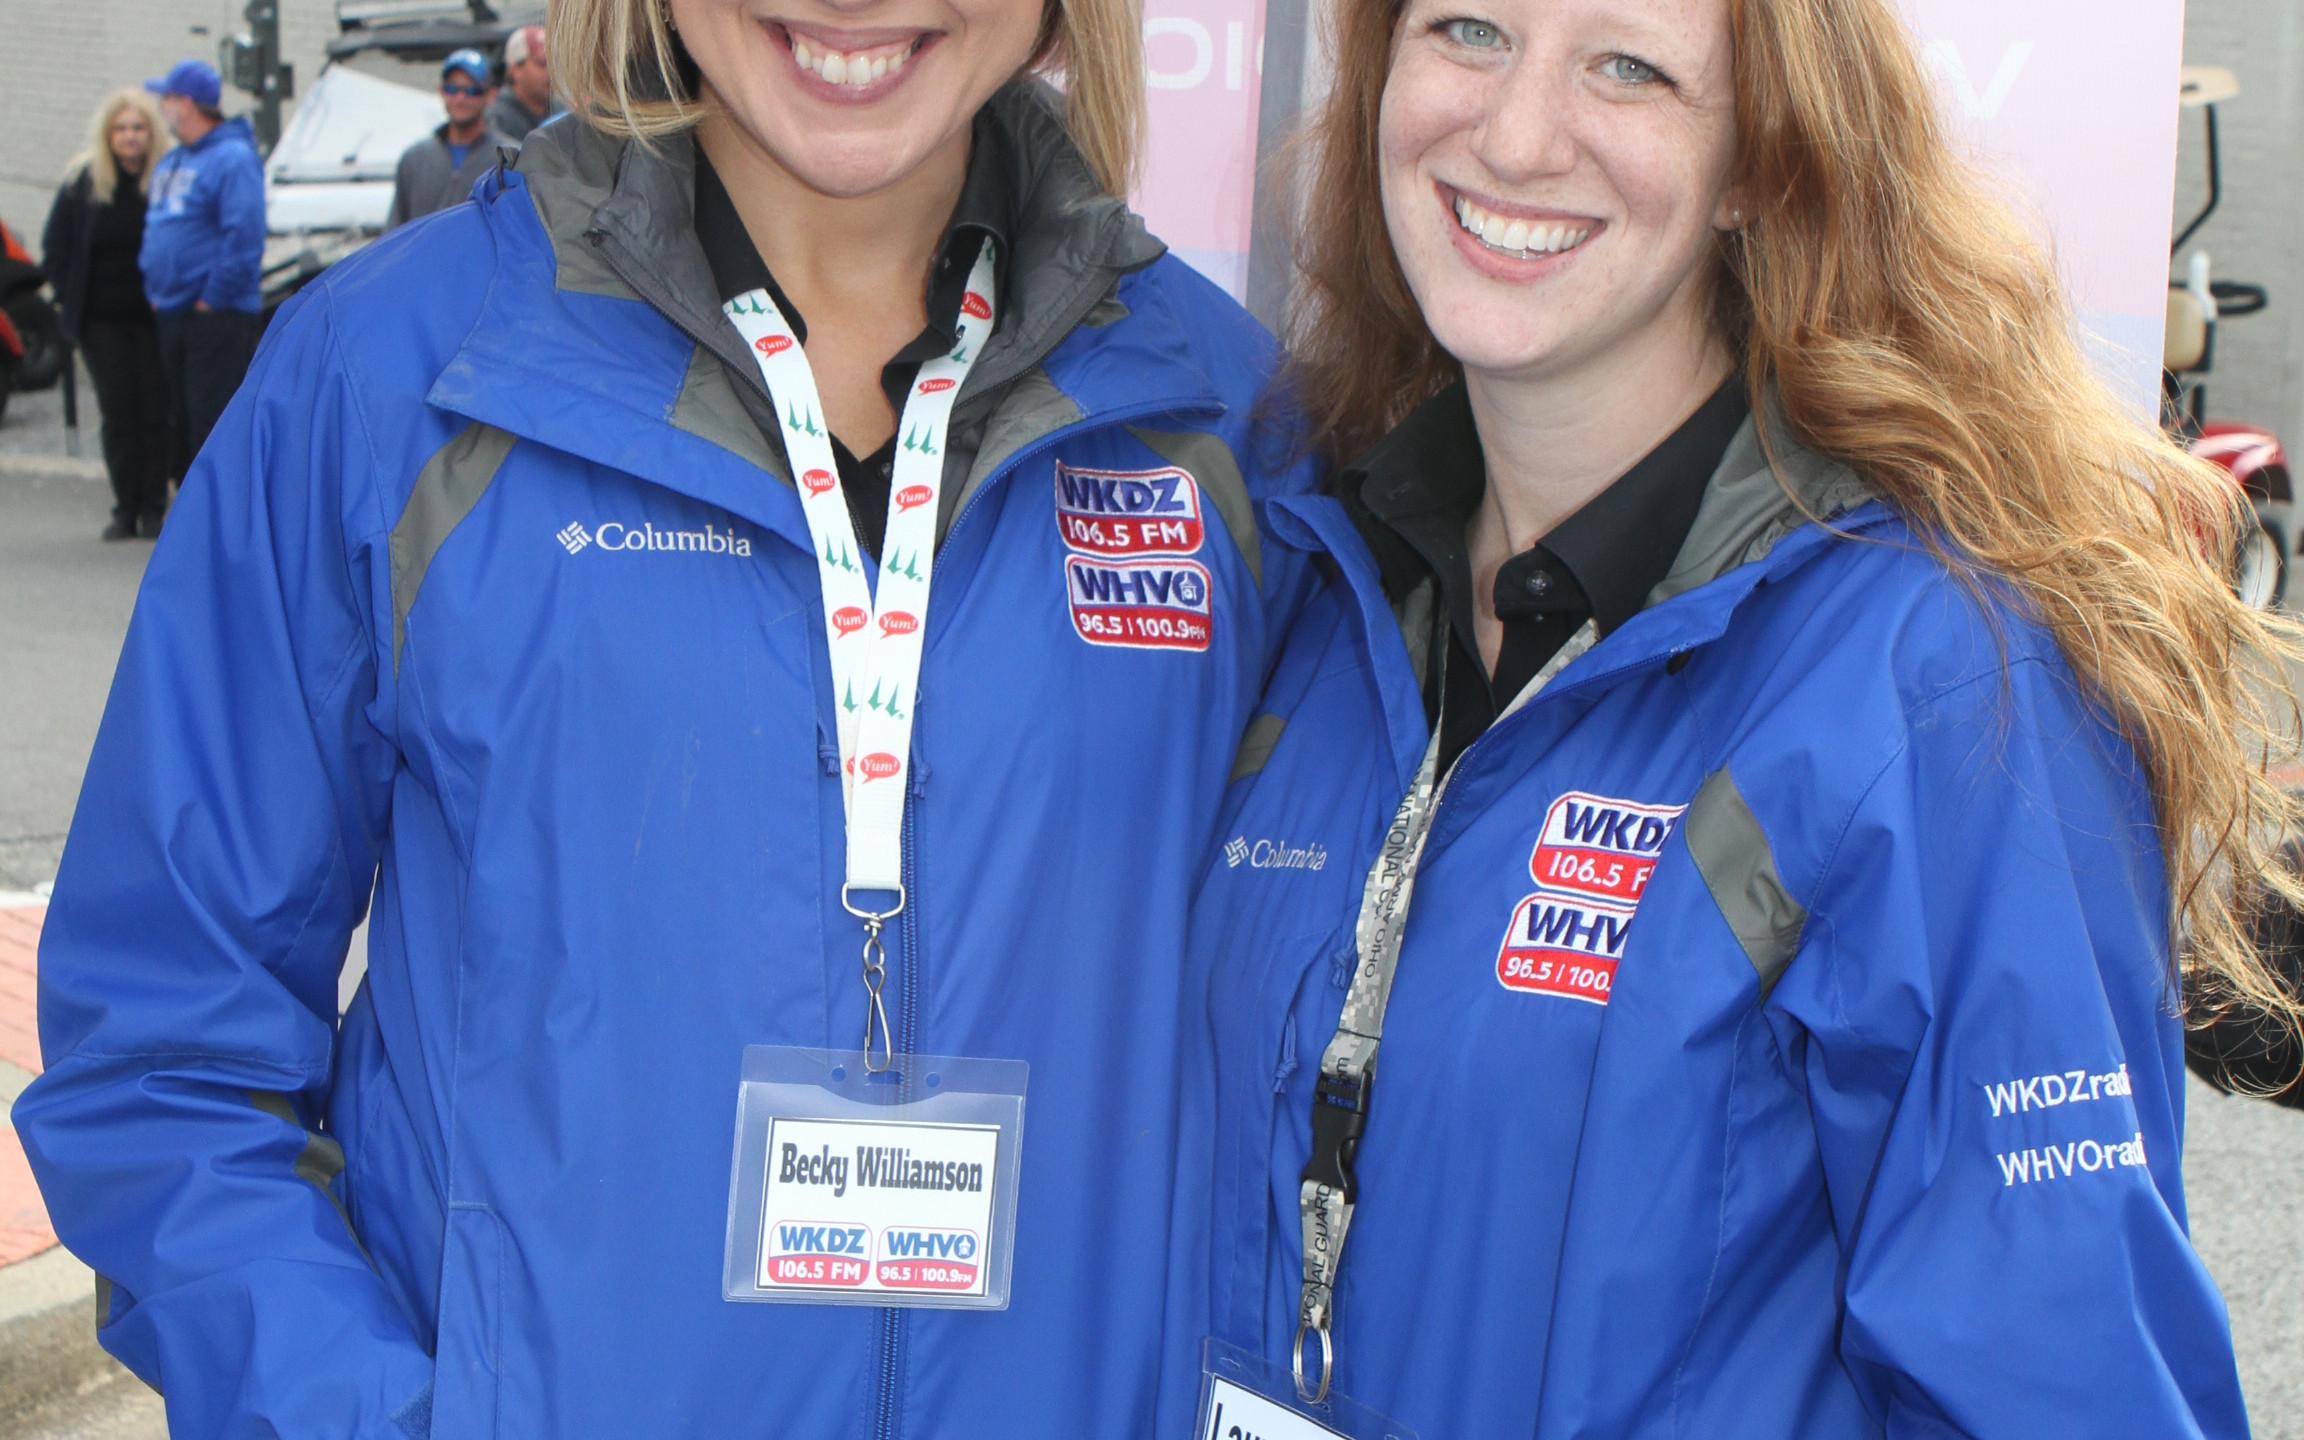 Becky Williamson, Lauren Atcher